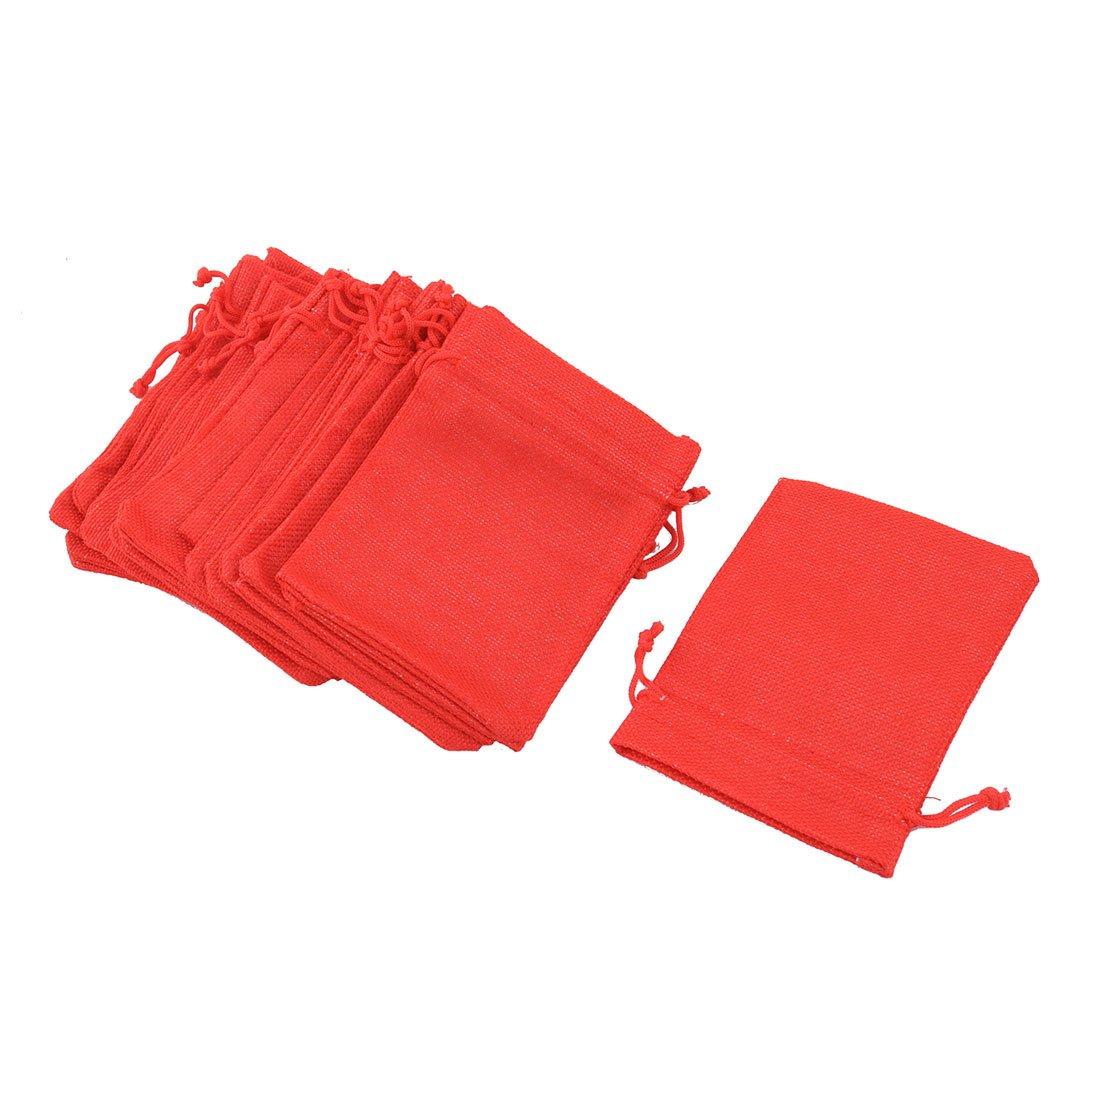 sourcingmap® Cotton Linen Outdoor Drawstring Design Jewelry Storage Bag Pouch 20pcs Dark Blue a17061000ux0286